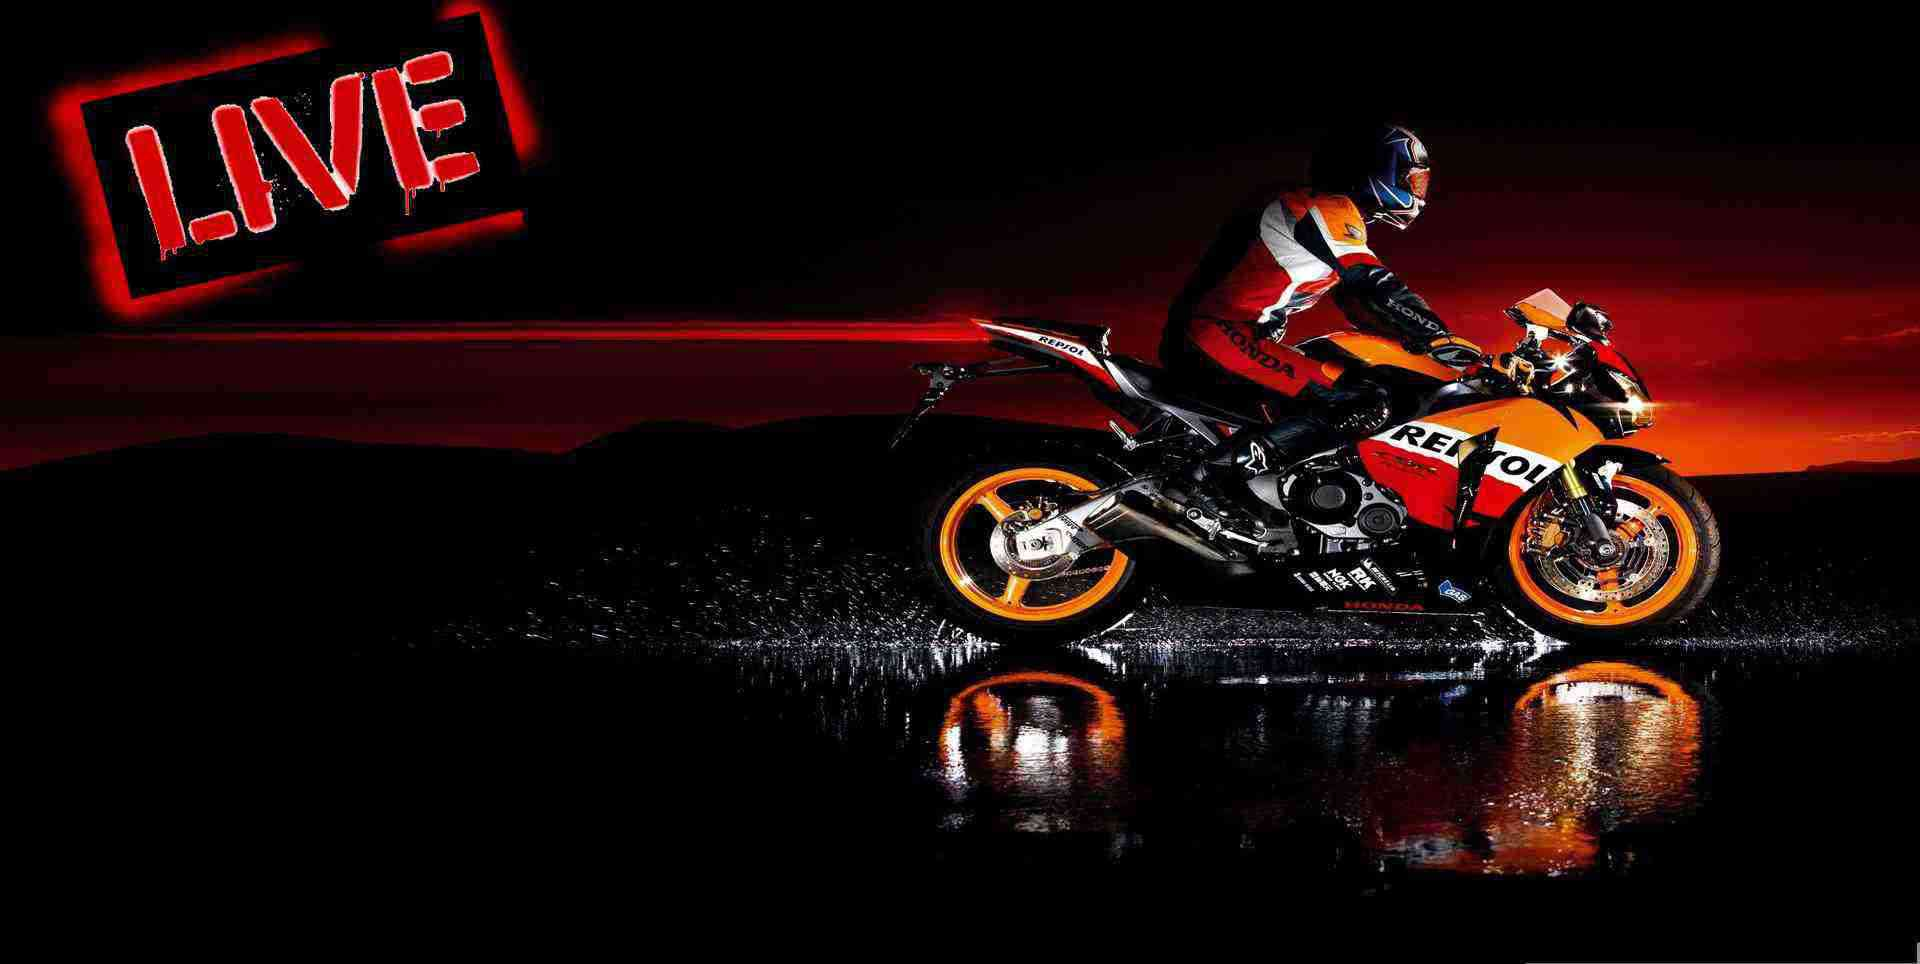 live-nerogiardini-motorrad-grand-prix-von-osterreich-online